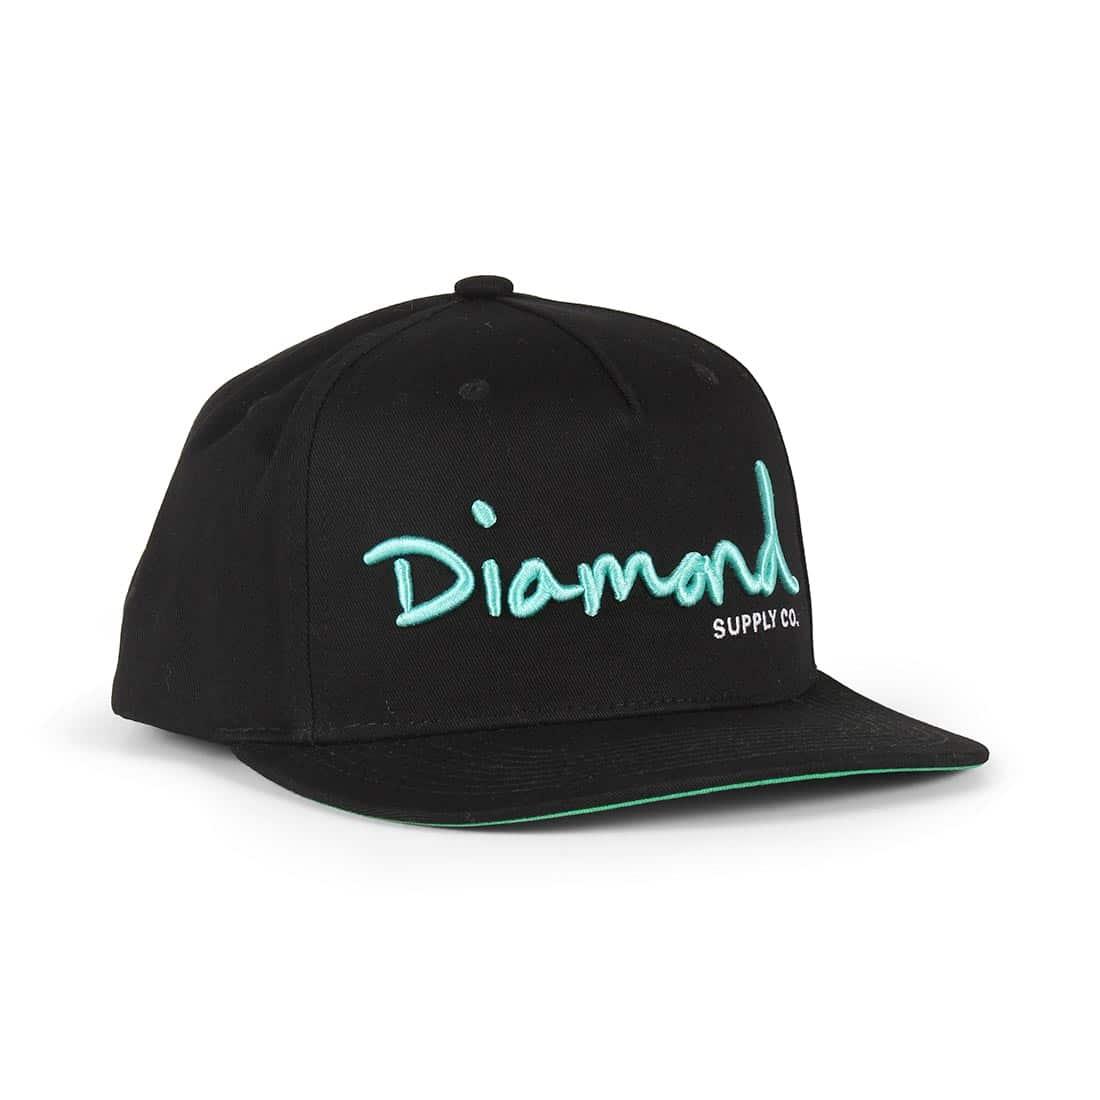 8c2484347fb4db Diamond Supply Co OG Script Snapback Hat – Black